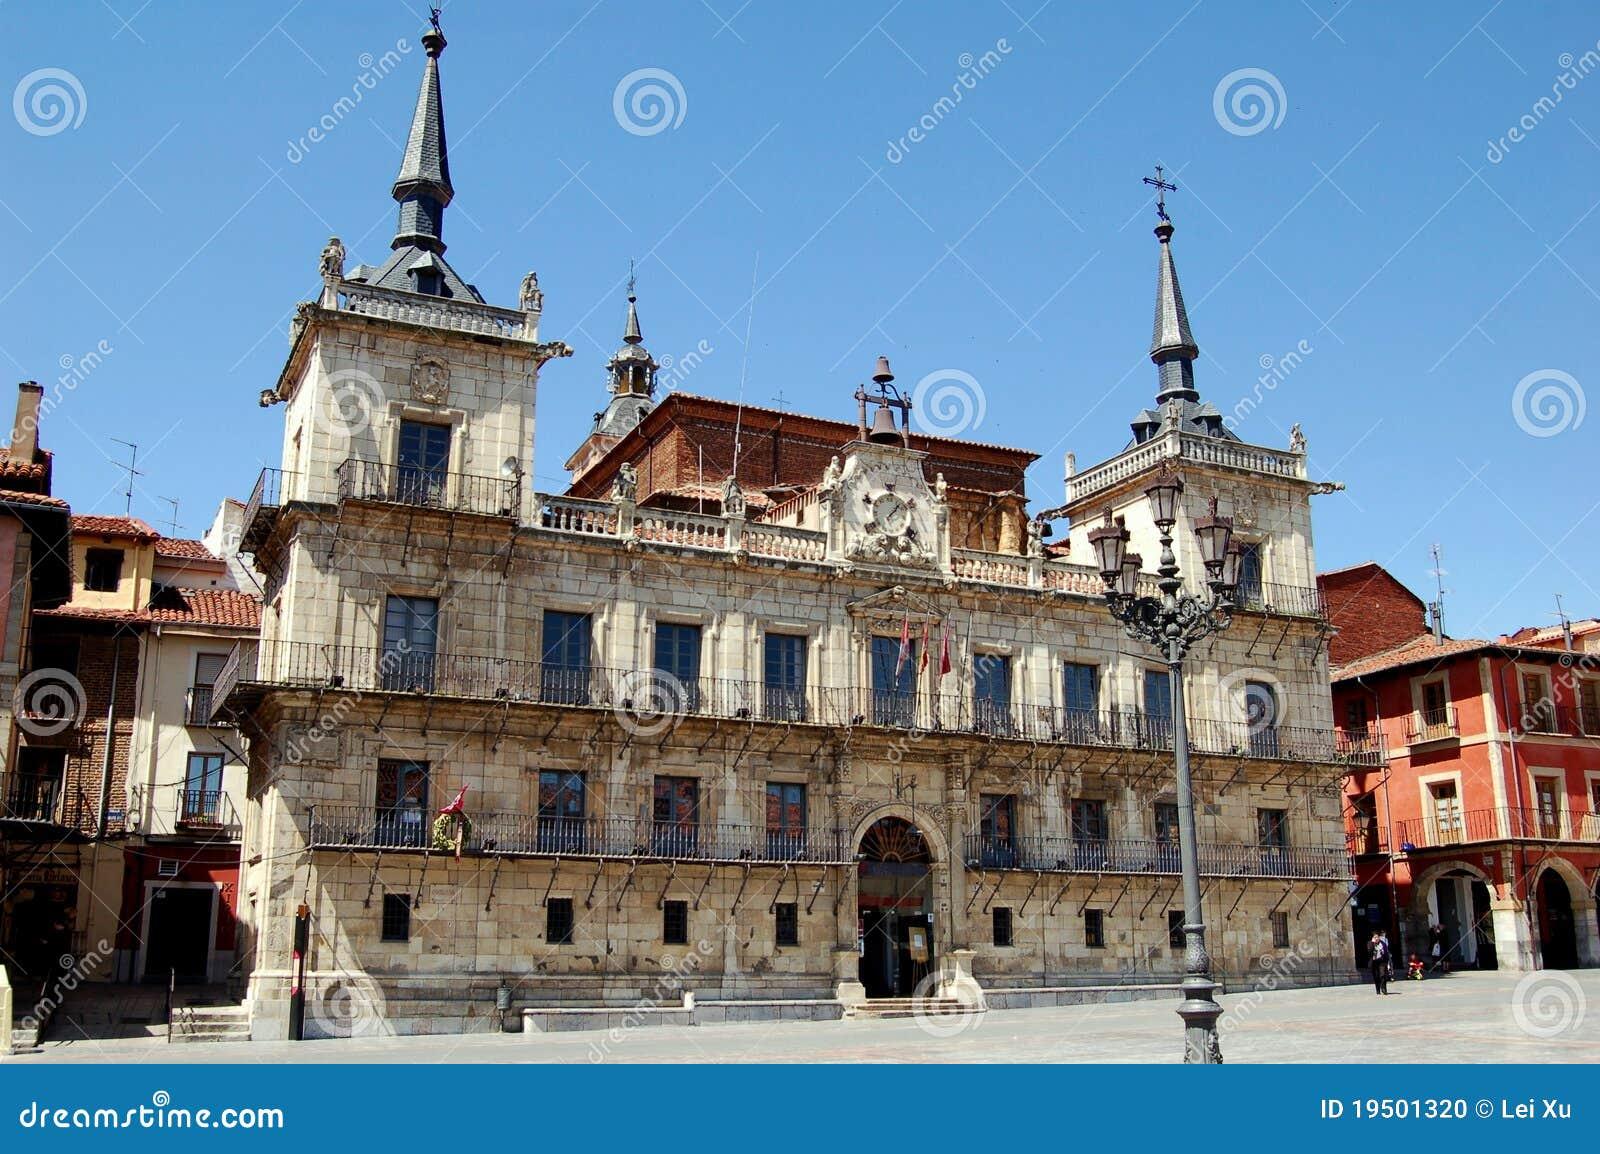 Leon, Spain: City Hall In Plaza Mayor Editorial Image - Image: 19501320